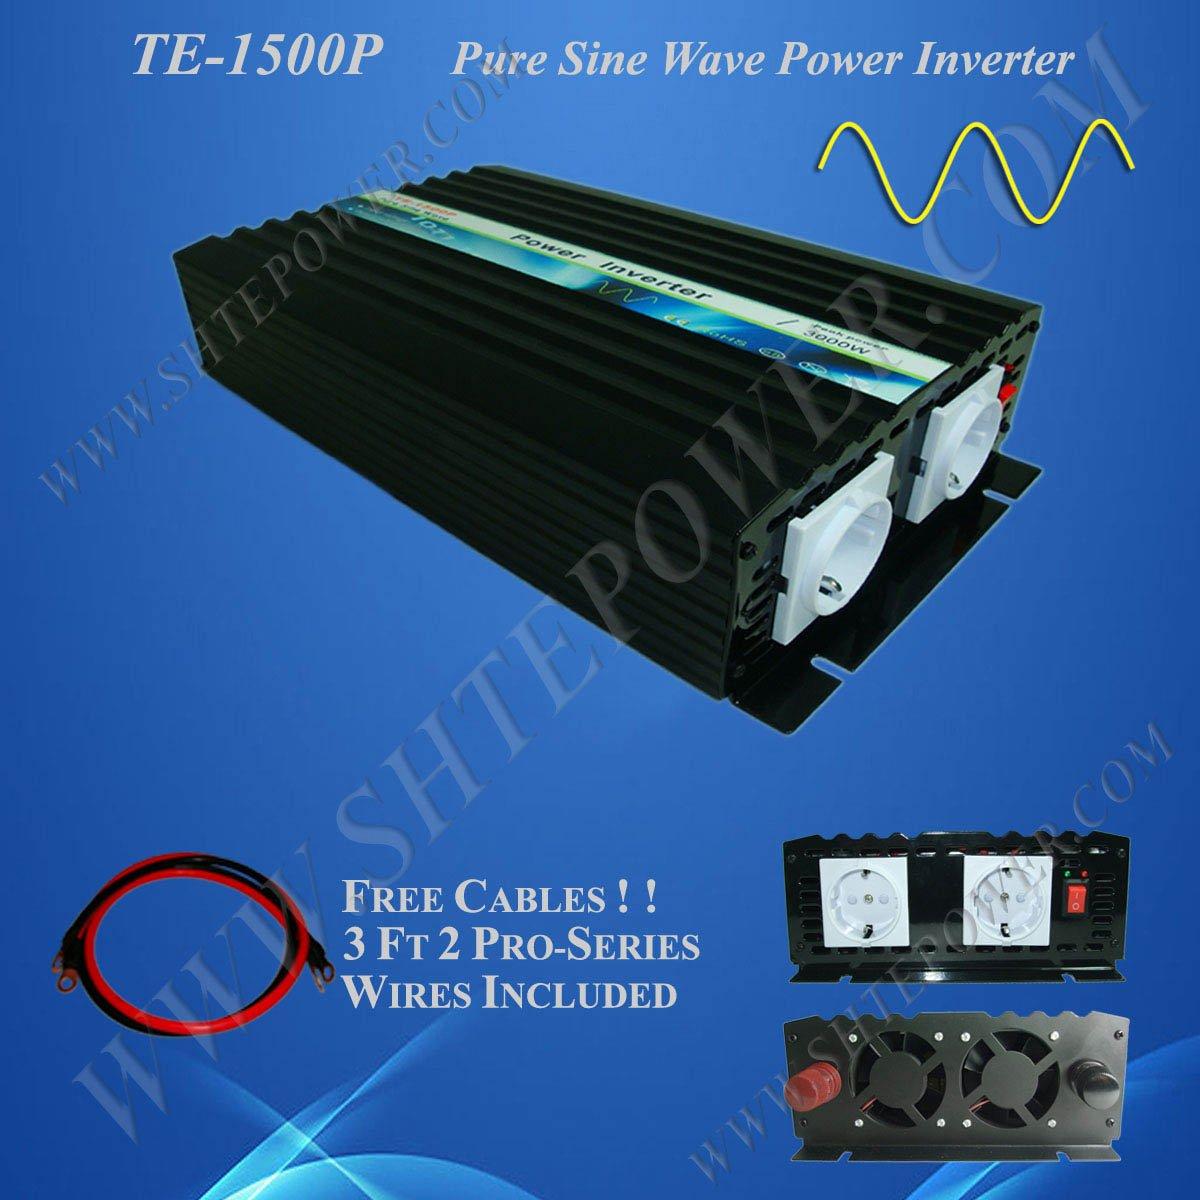 48VDC to 100VAC 1500watts Pure Sine Wave Power Inverter sbmr 501 100vac